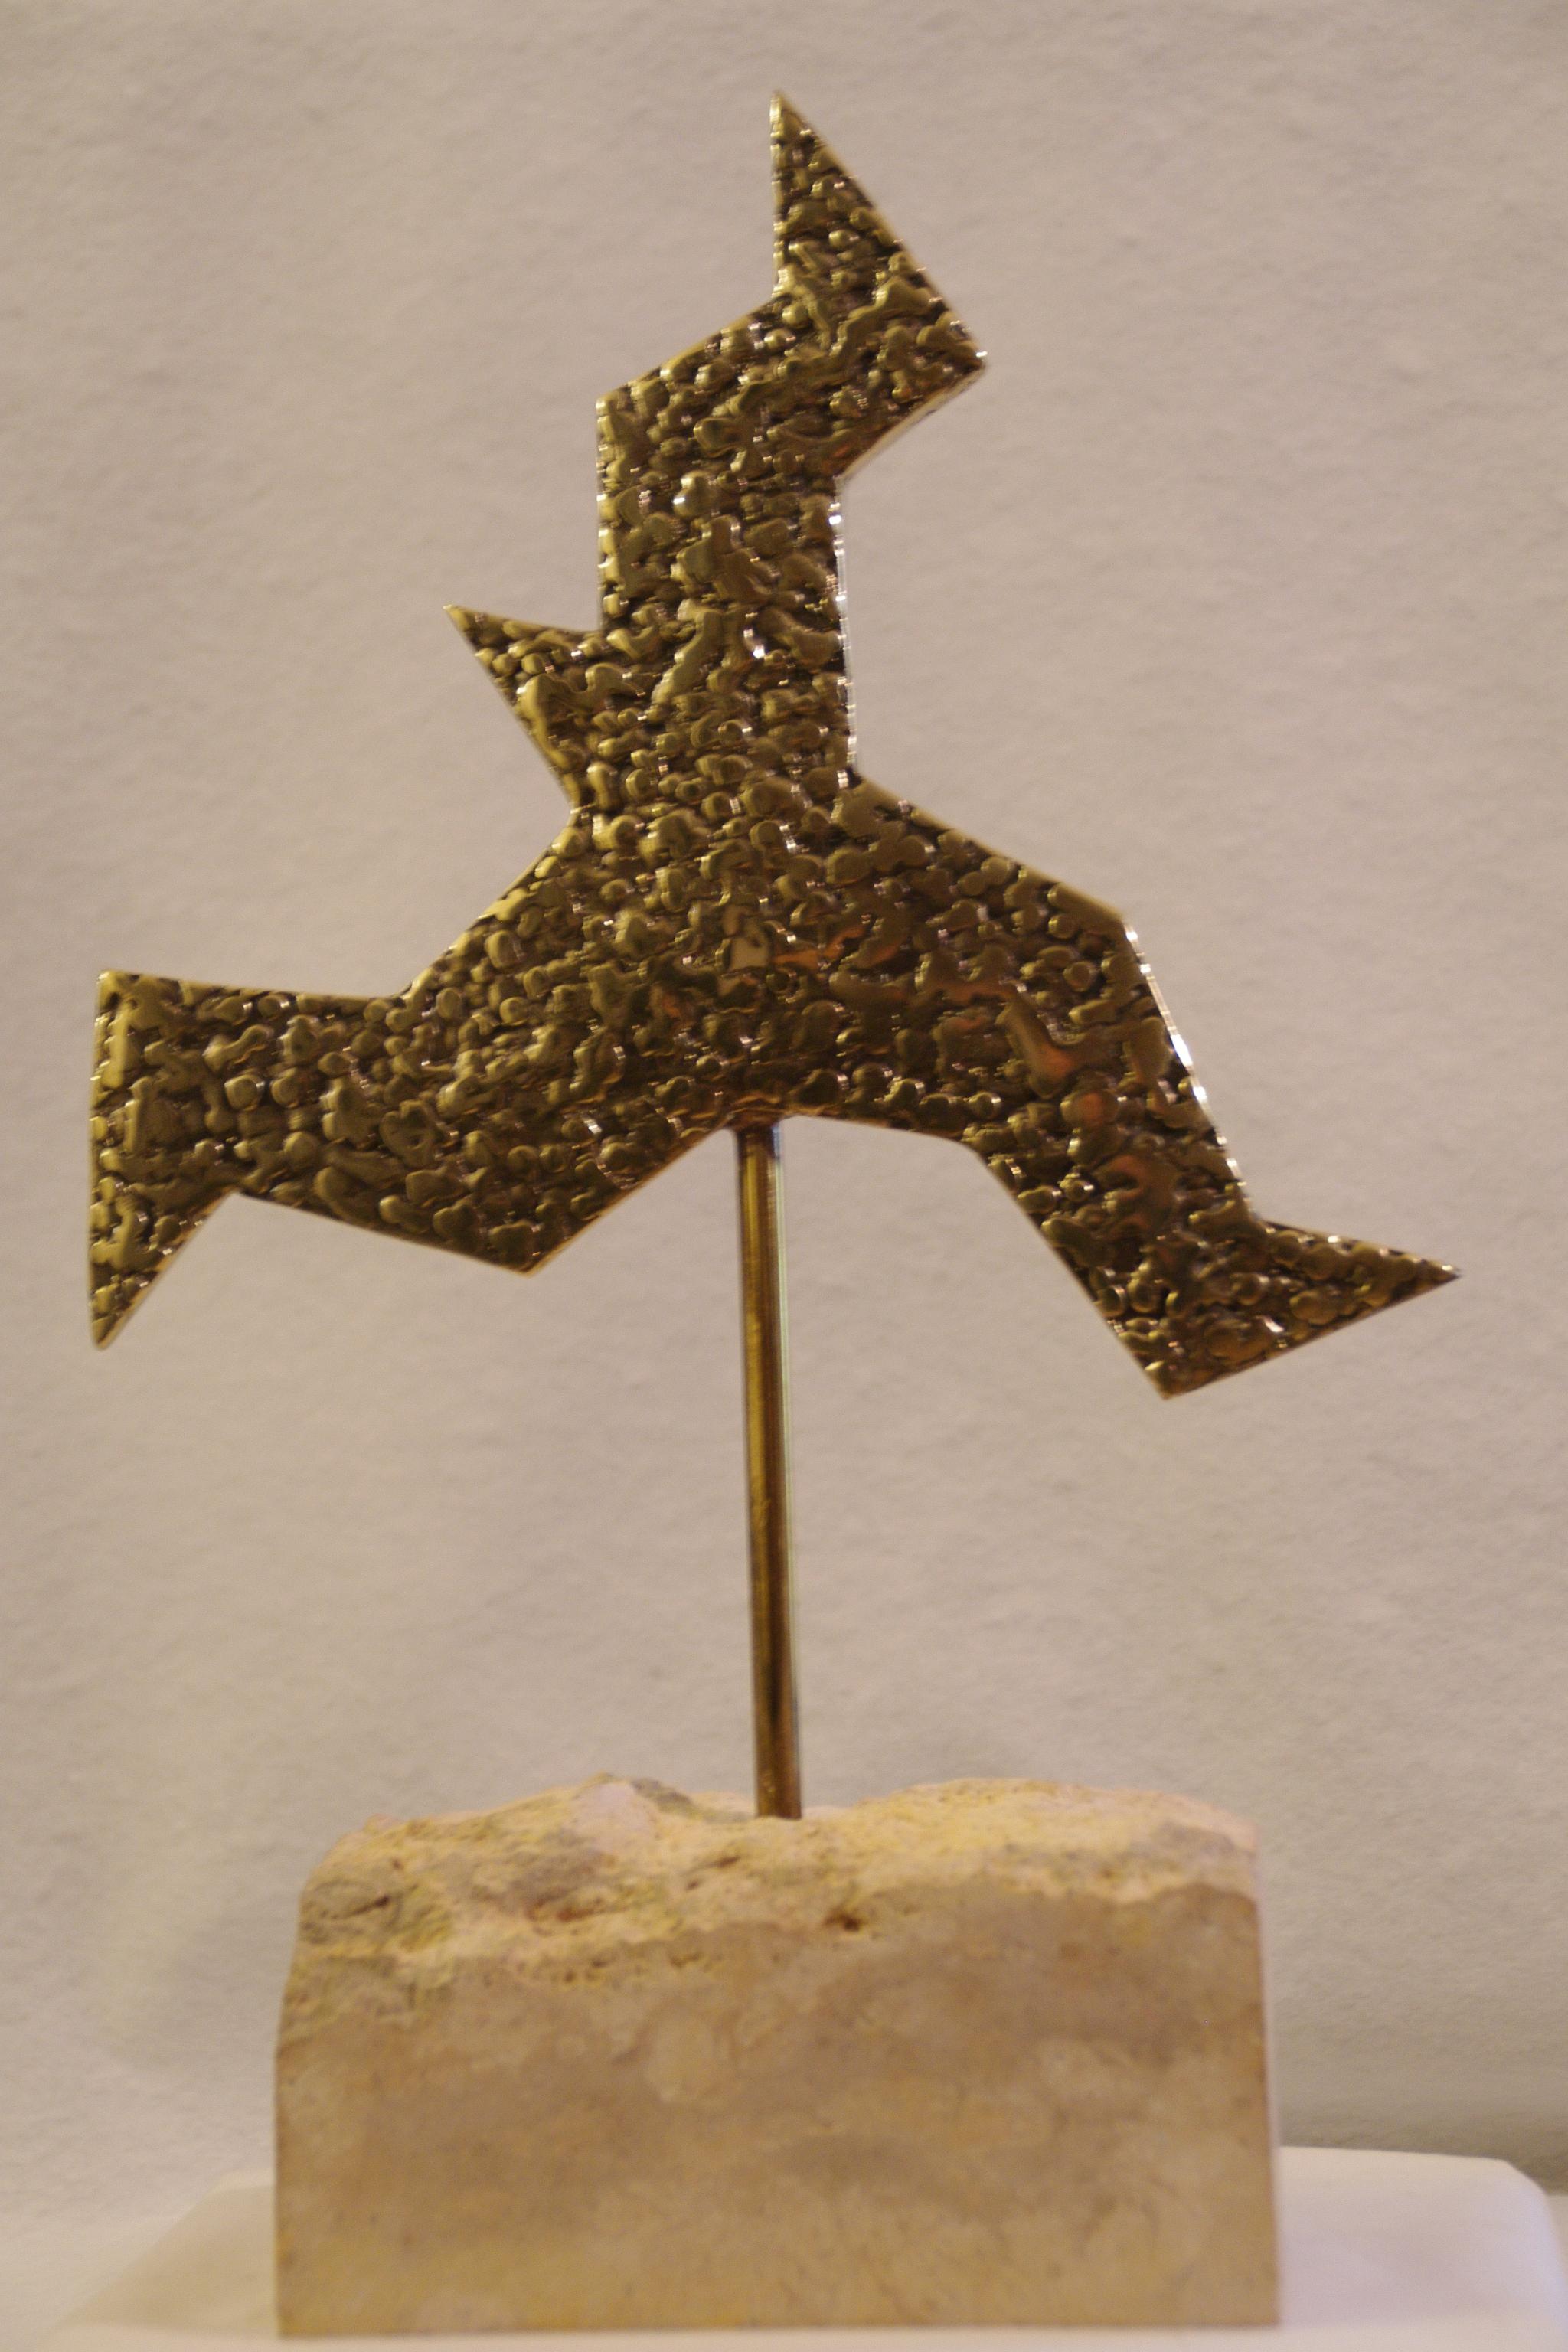 QUO VADIS - Bronze à cire perdue - Exemplaire unique